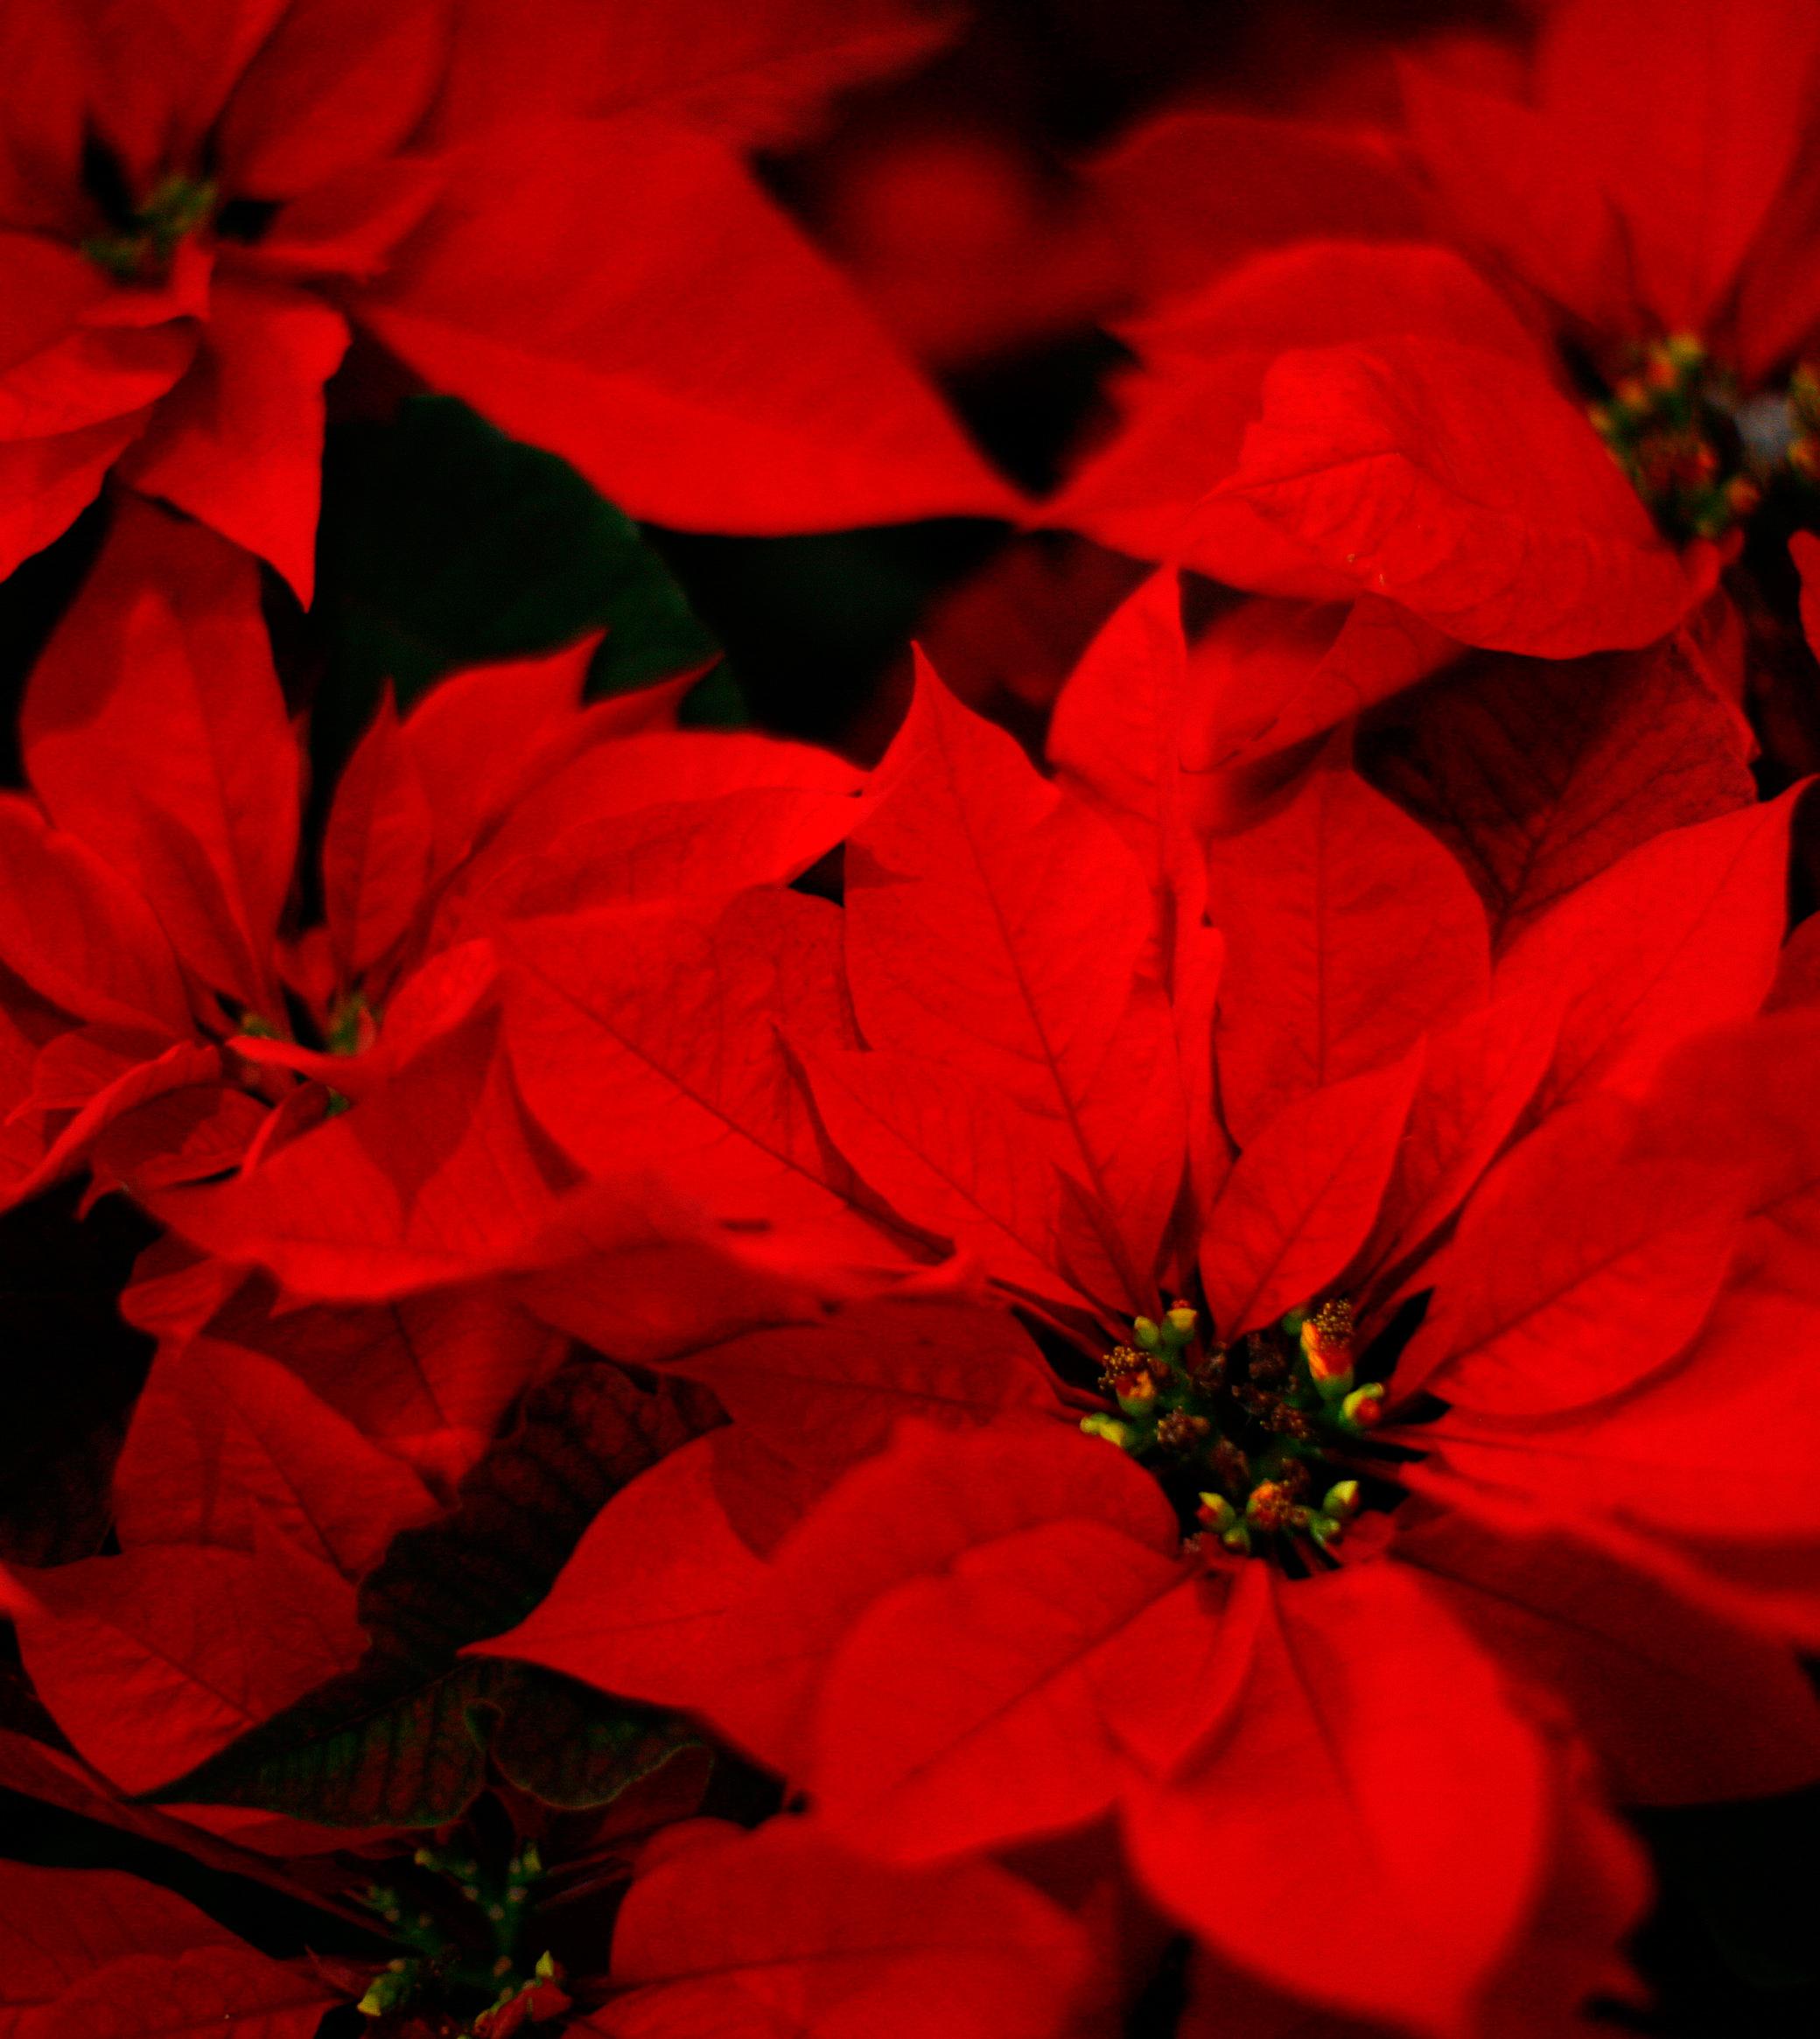 Garden Plot: Rosemary trees, poinsettias and fresh Christmas trees